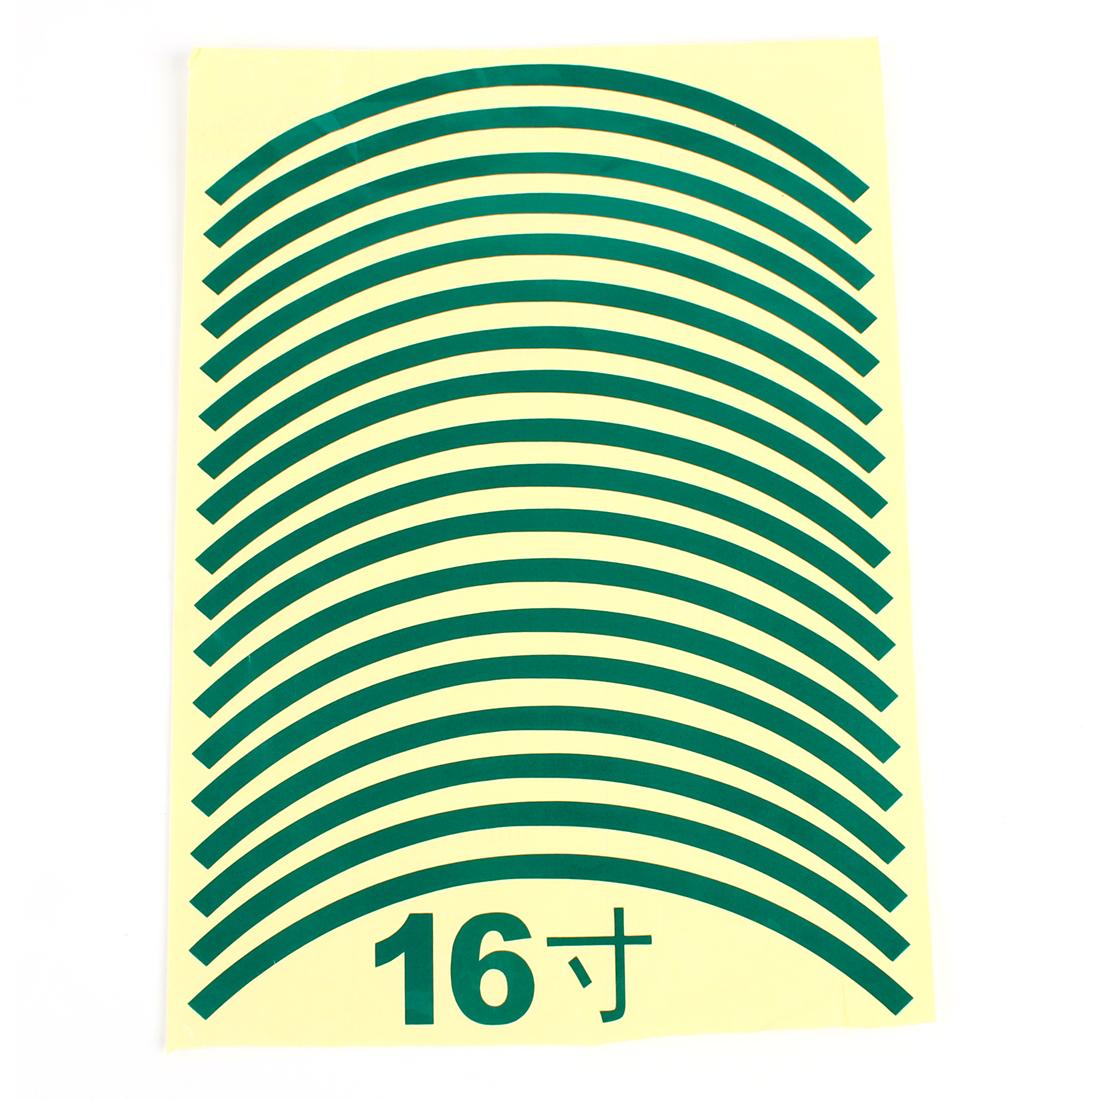 "18pcs 31.5cm Length Car Van Tire Rim Green Decorative Sticker for 16"" Wheels"